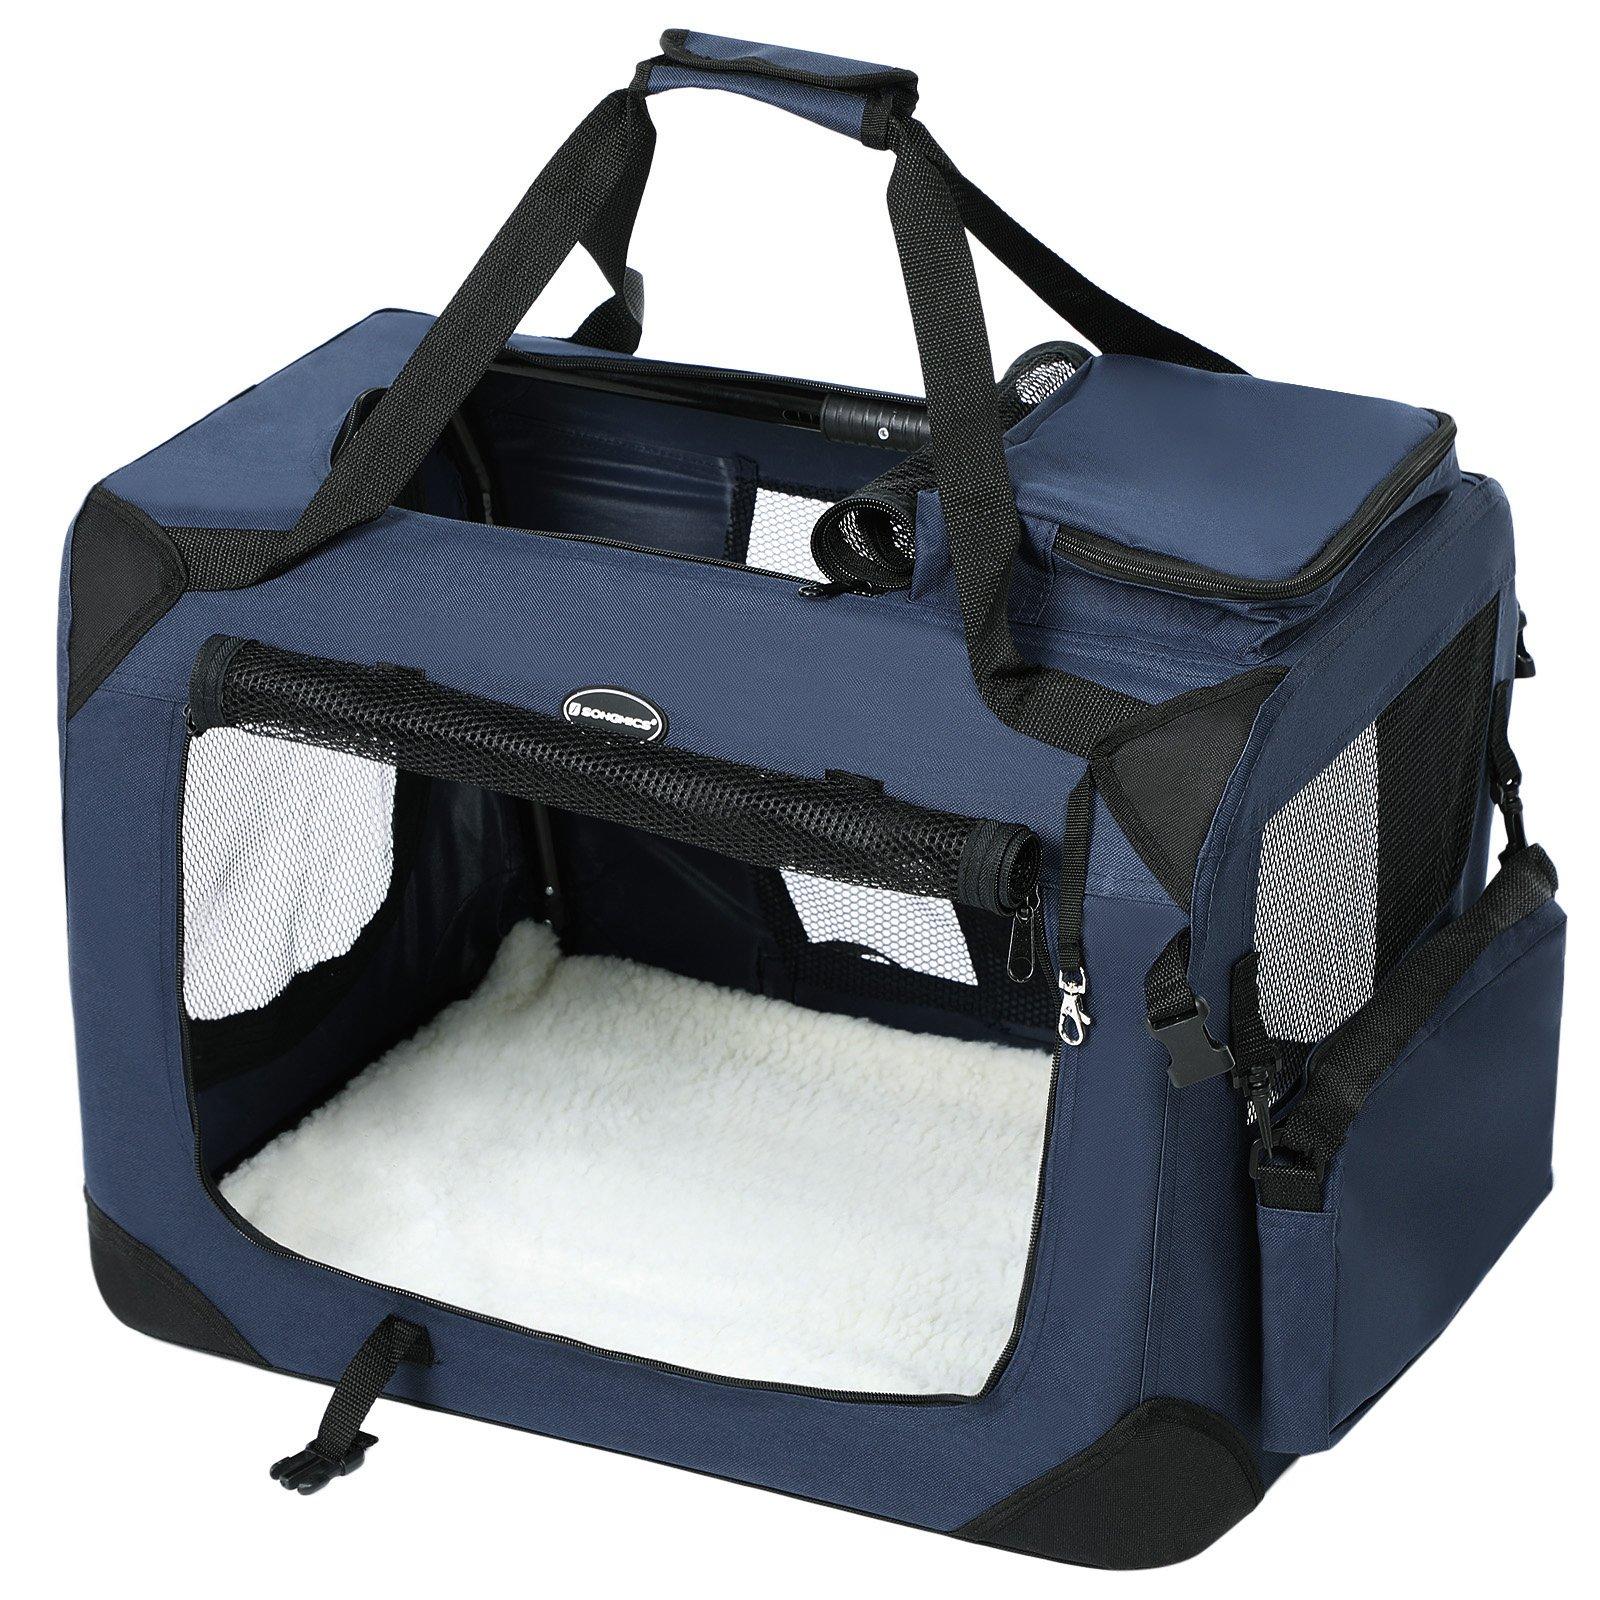 SONGMICS 70 x 52 x 52 cm Bolsa de Transporte para Mascotas Transportín Plegable para Perro Portador Tela Oxford Azul Oscuro PDC70Z